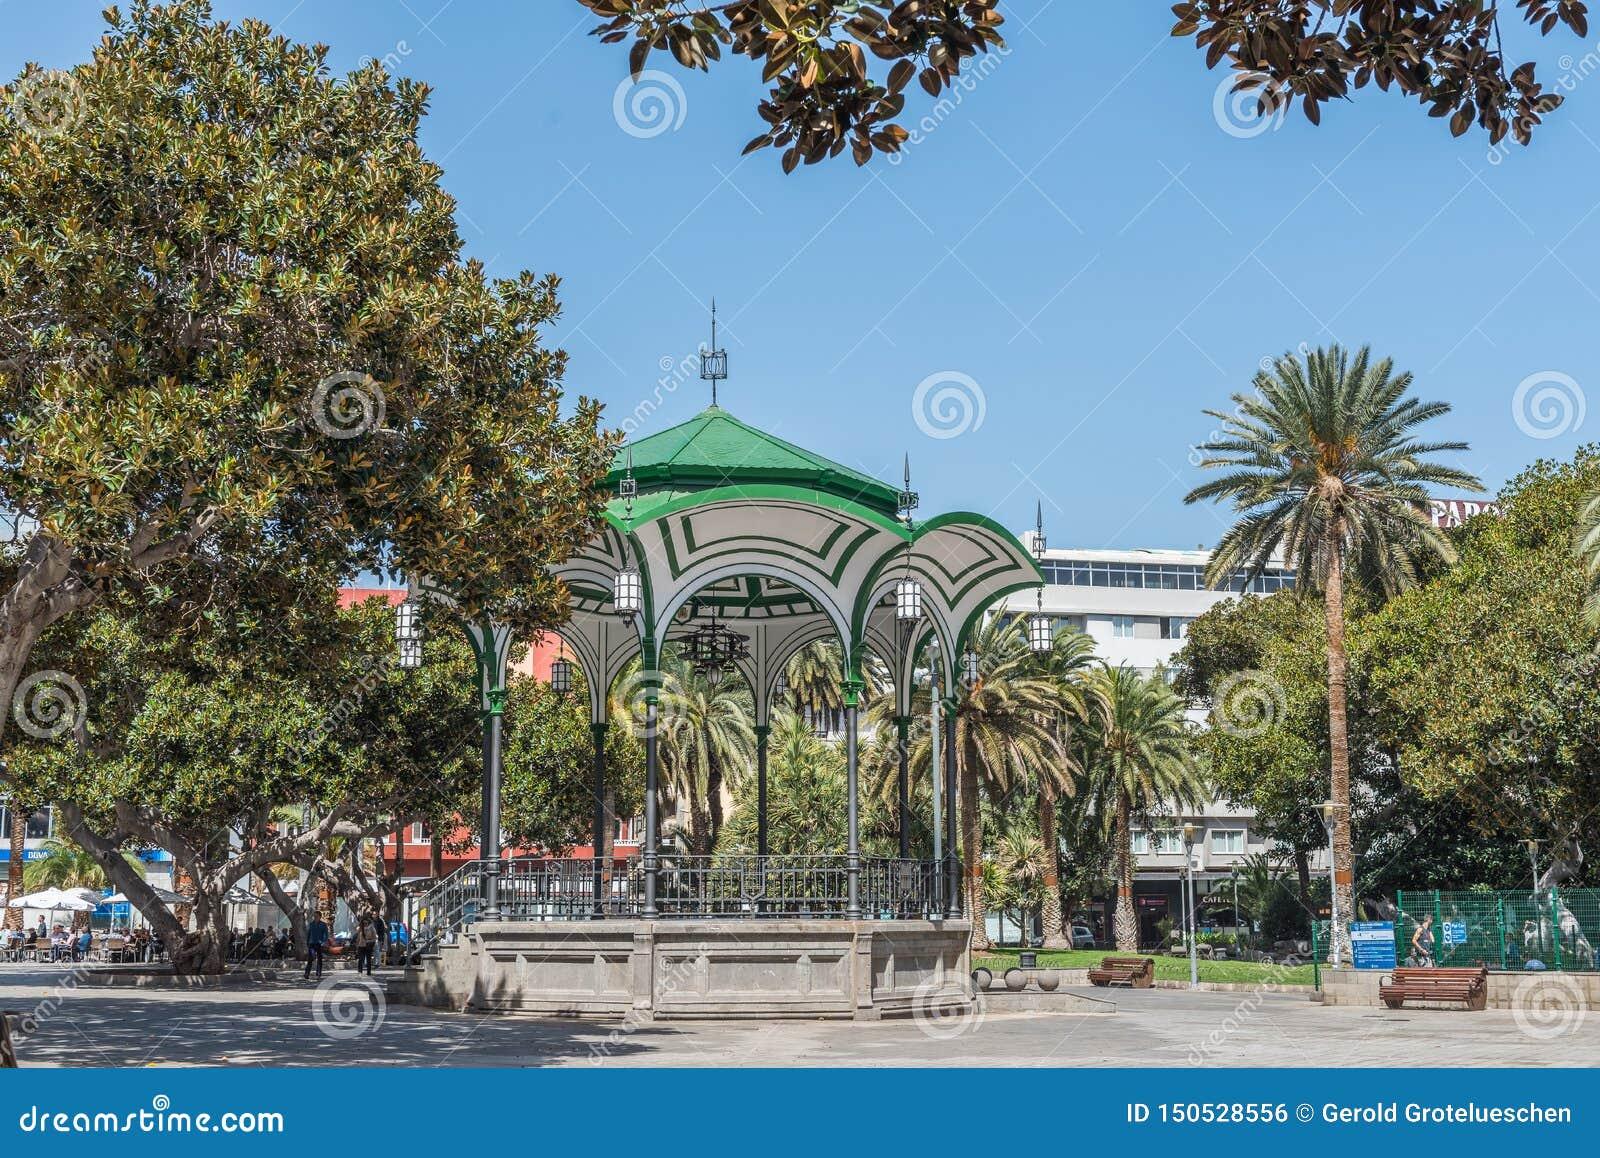 LAS PALMAS DE GRAN CANARIA HISZPANIA, MARZEC, - 10, 2019: Uliczny widok Widok altana na miasto ulicie